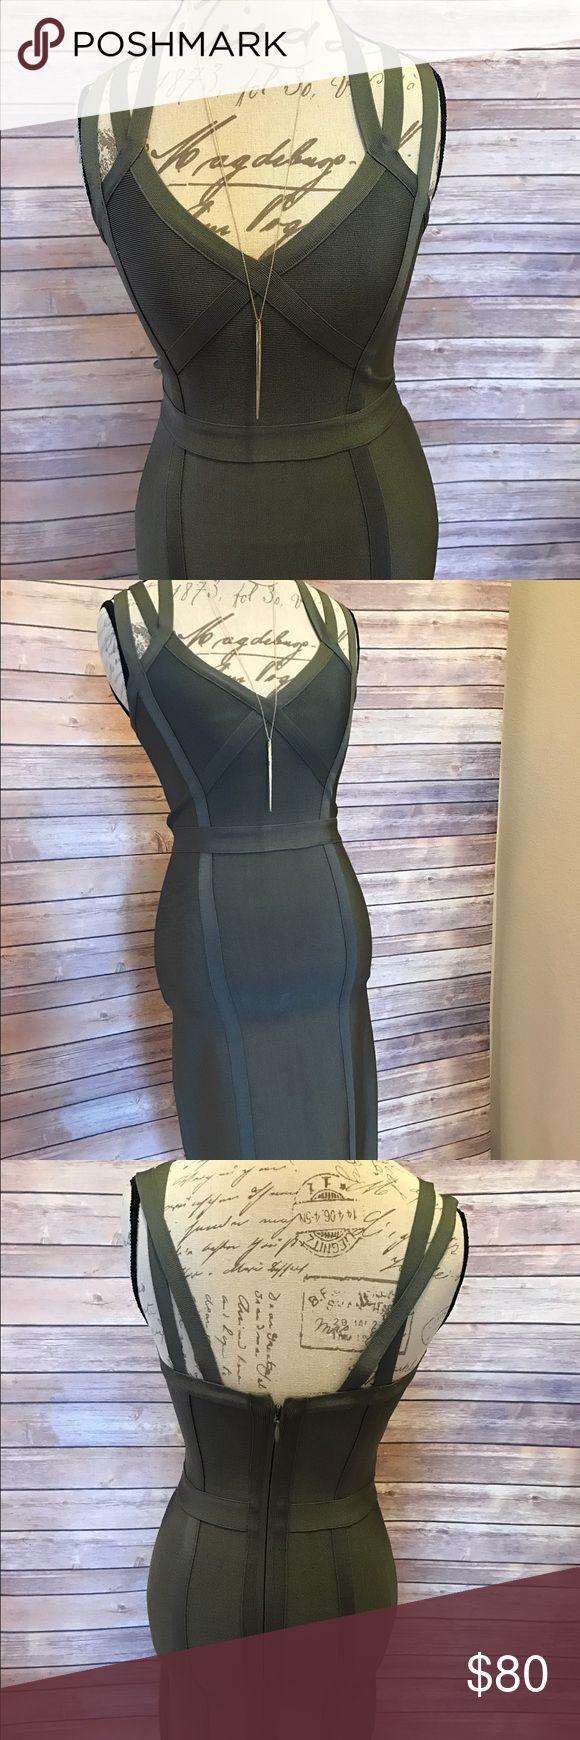 Bebe bandage dress Army green Bebe bandage dress, form fitting and very curve flattering. NWOT bebe Dresses Midi